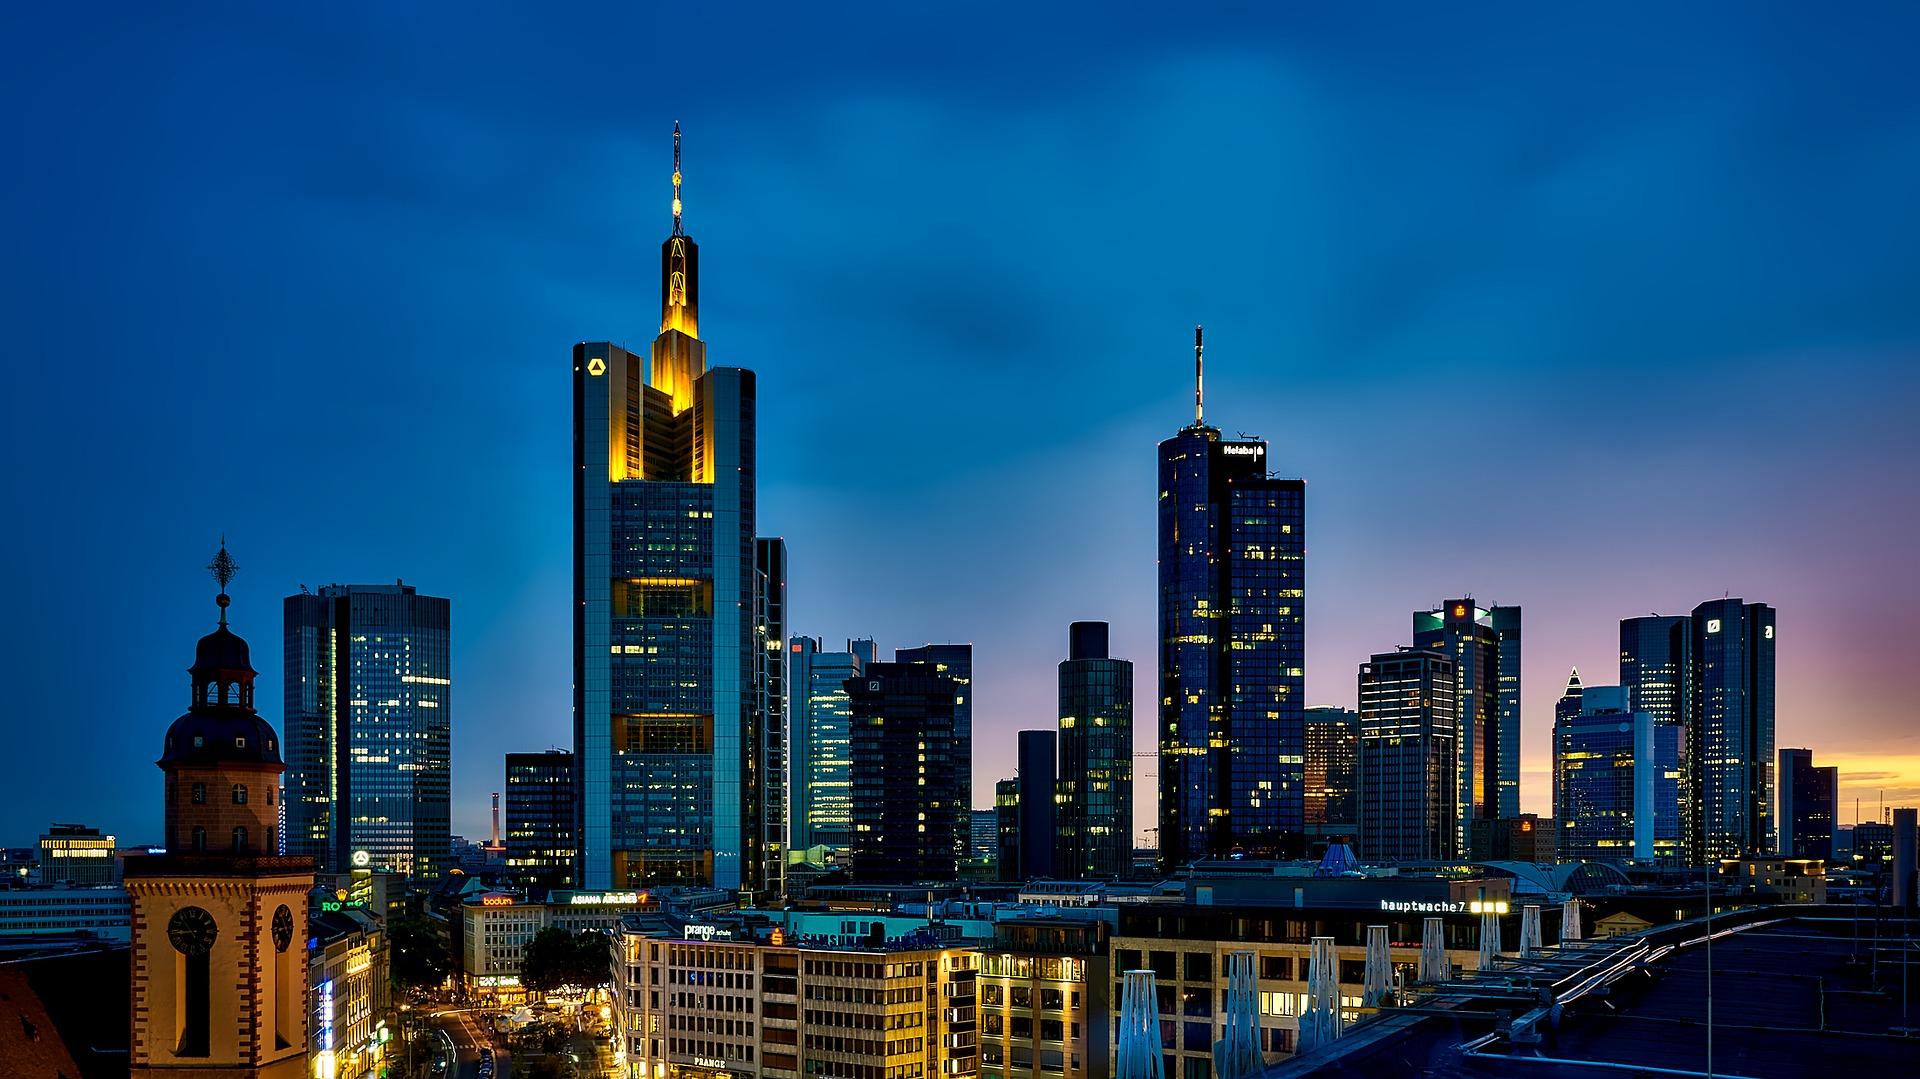 Alles über Sprinter mieten Frankfurt [Guide]